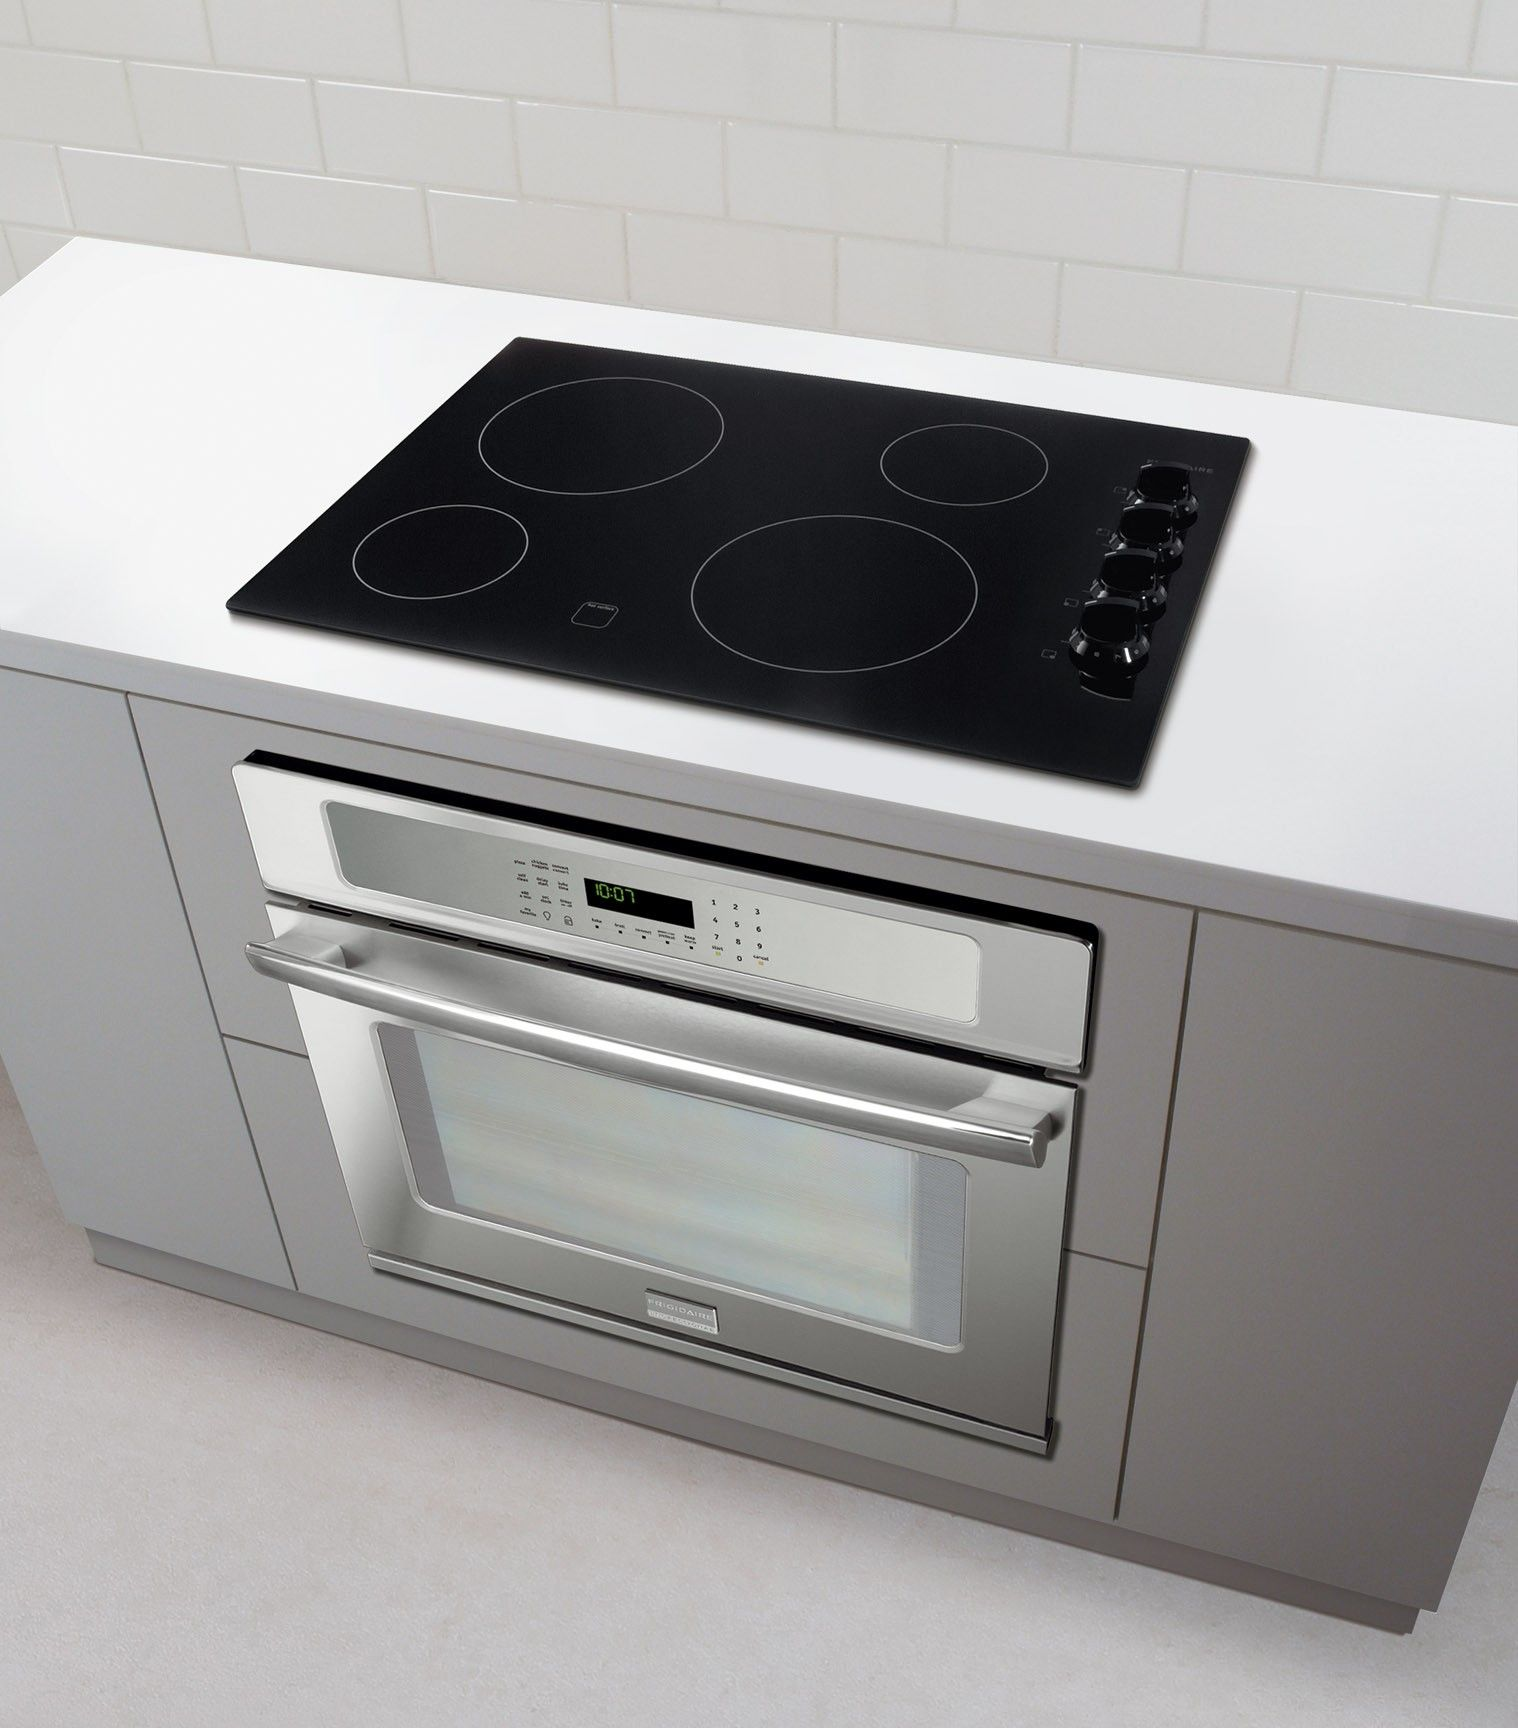 Frigidaire Electric Cooktop Reviews